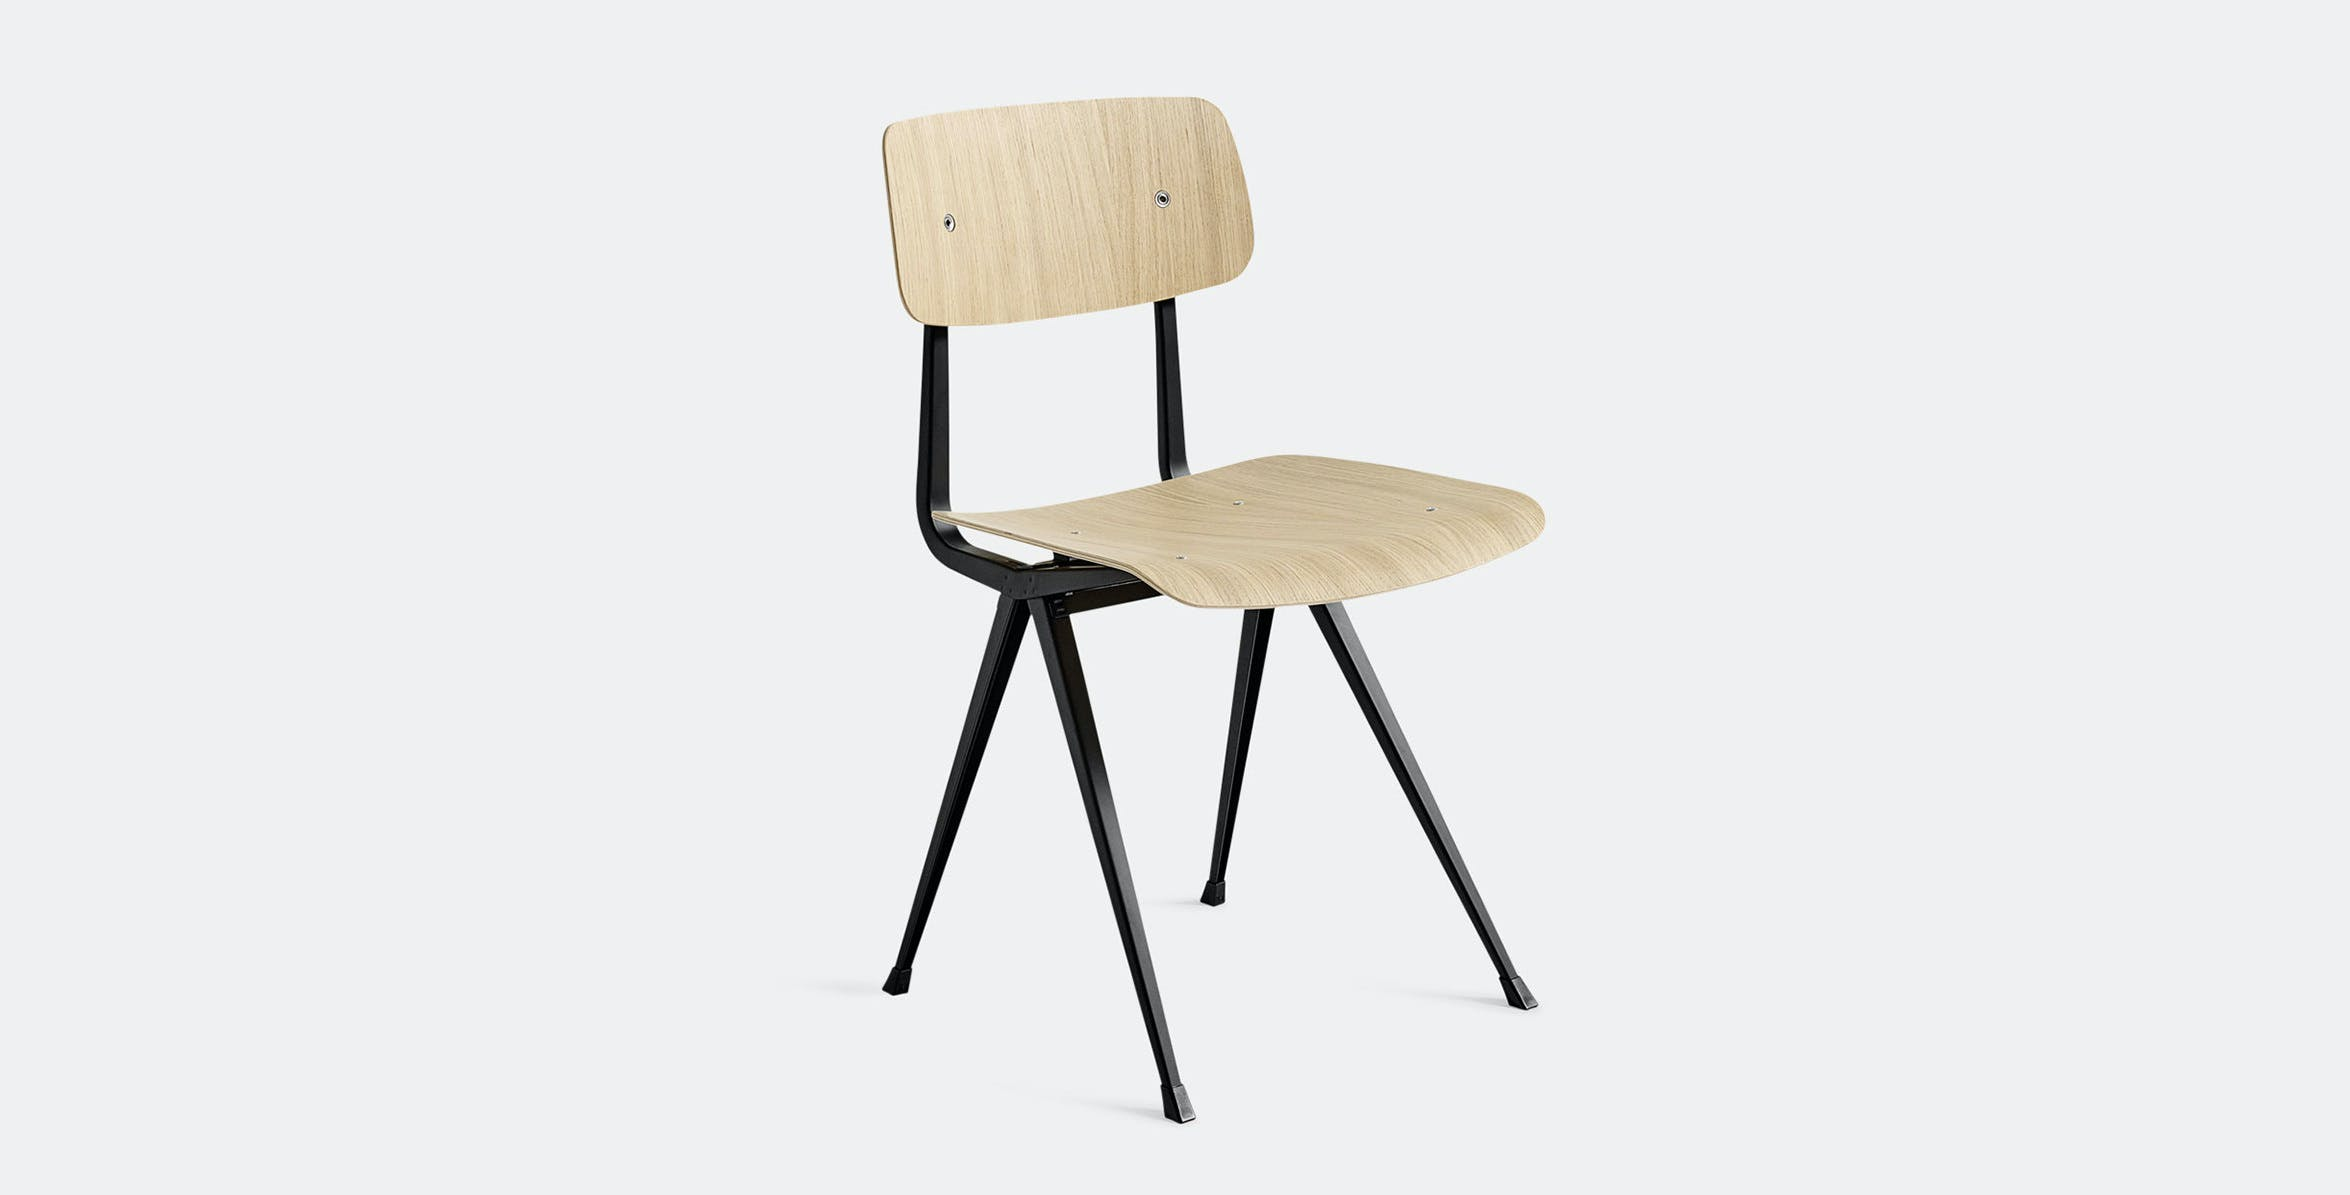 Designers Wim Rietveld Friso Kramer